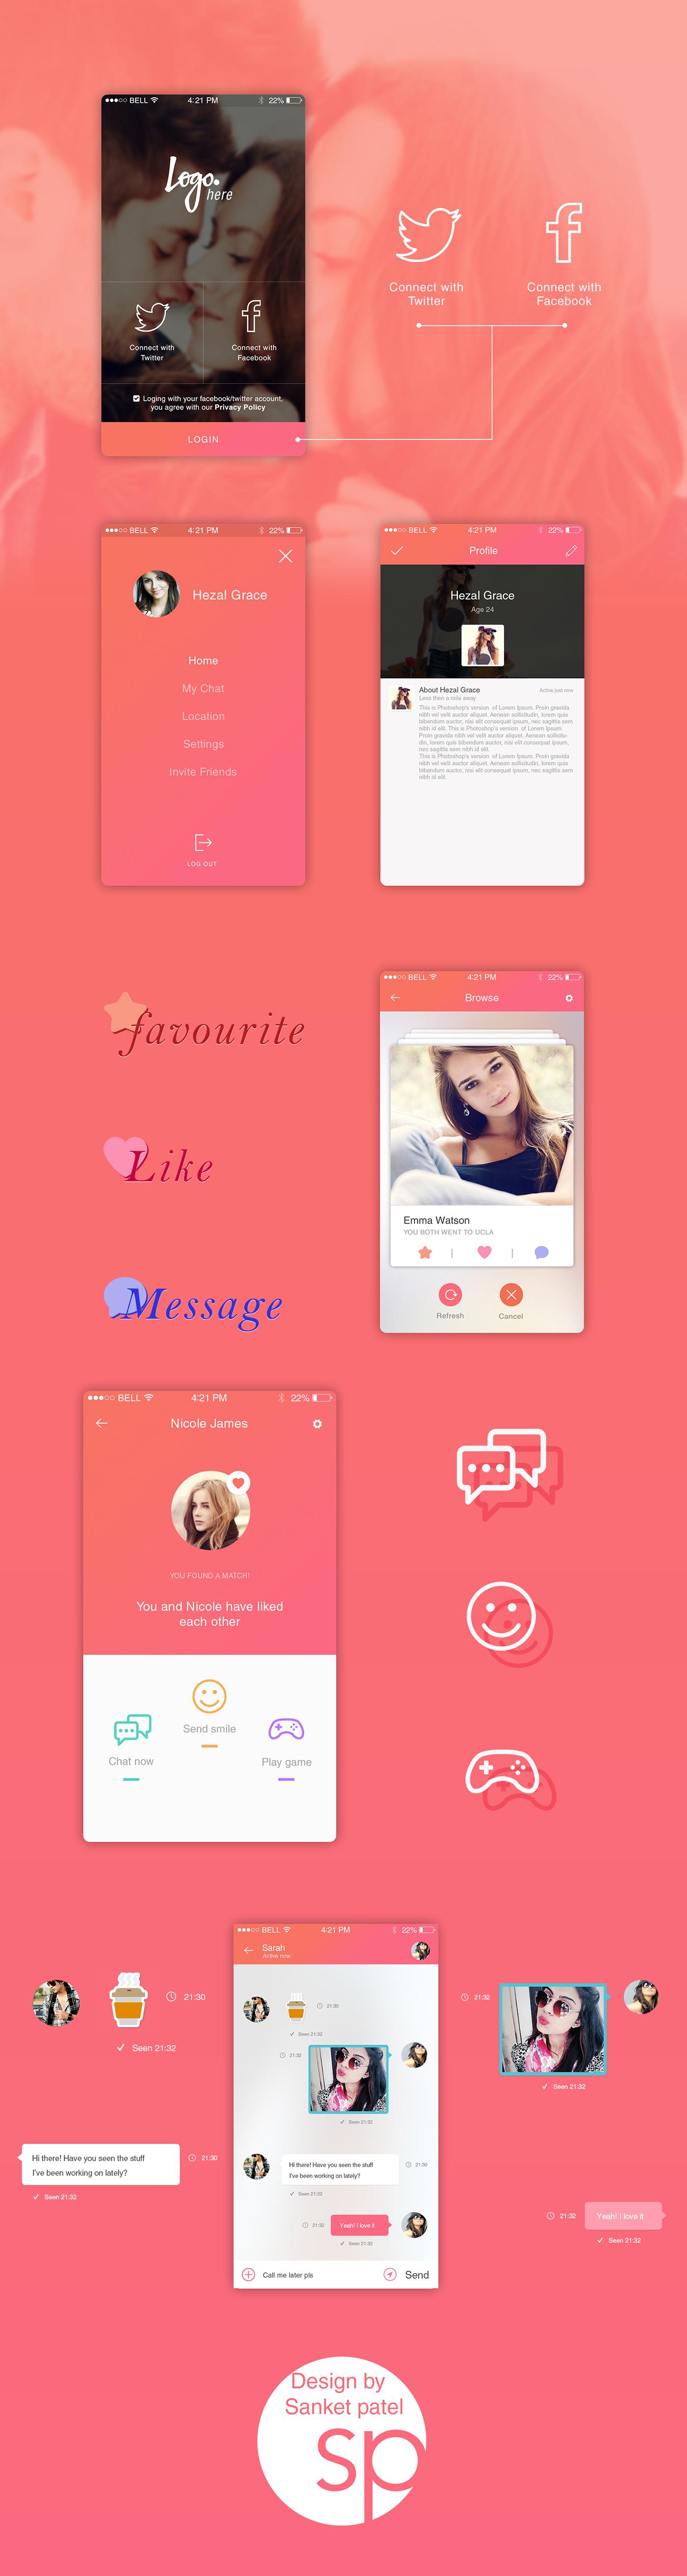 best ipad dating apps